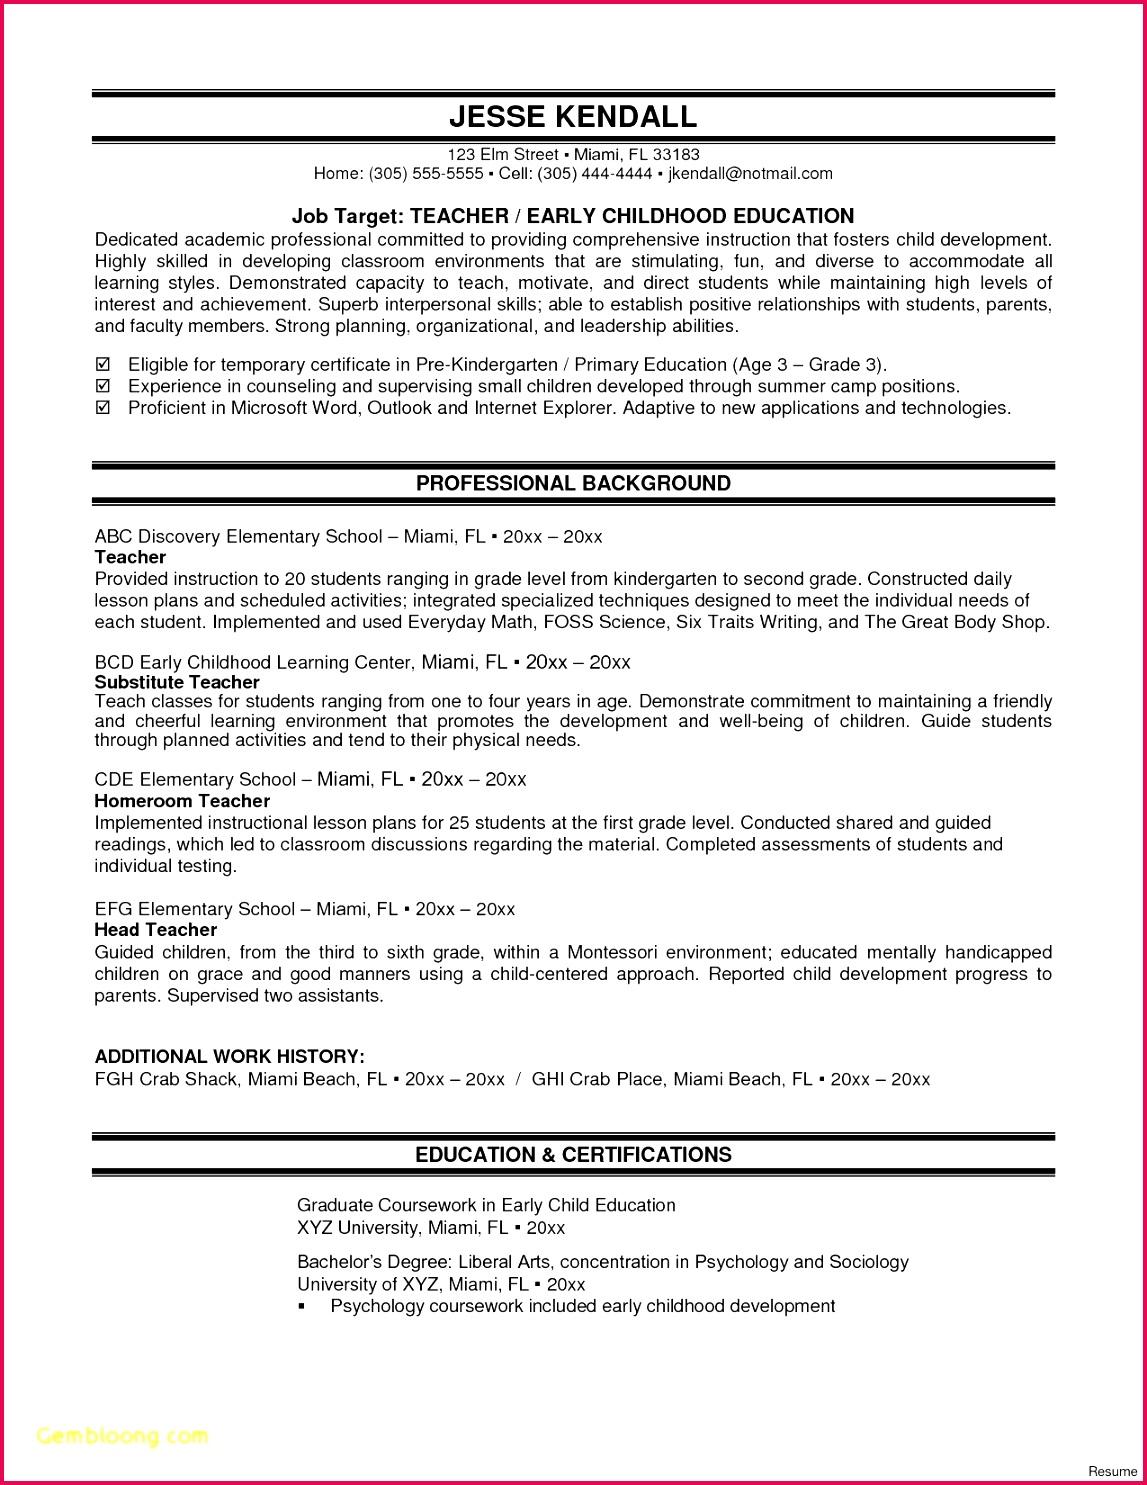 free online simple resume template free teacher resume templates lovely fresh pr resume template of free online simple resume template